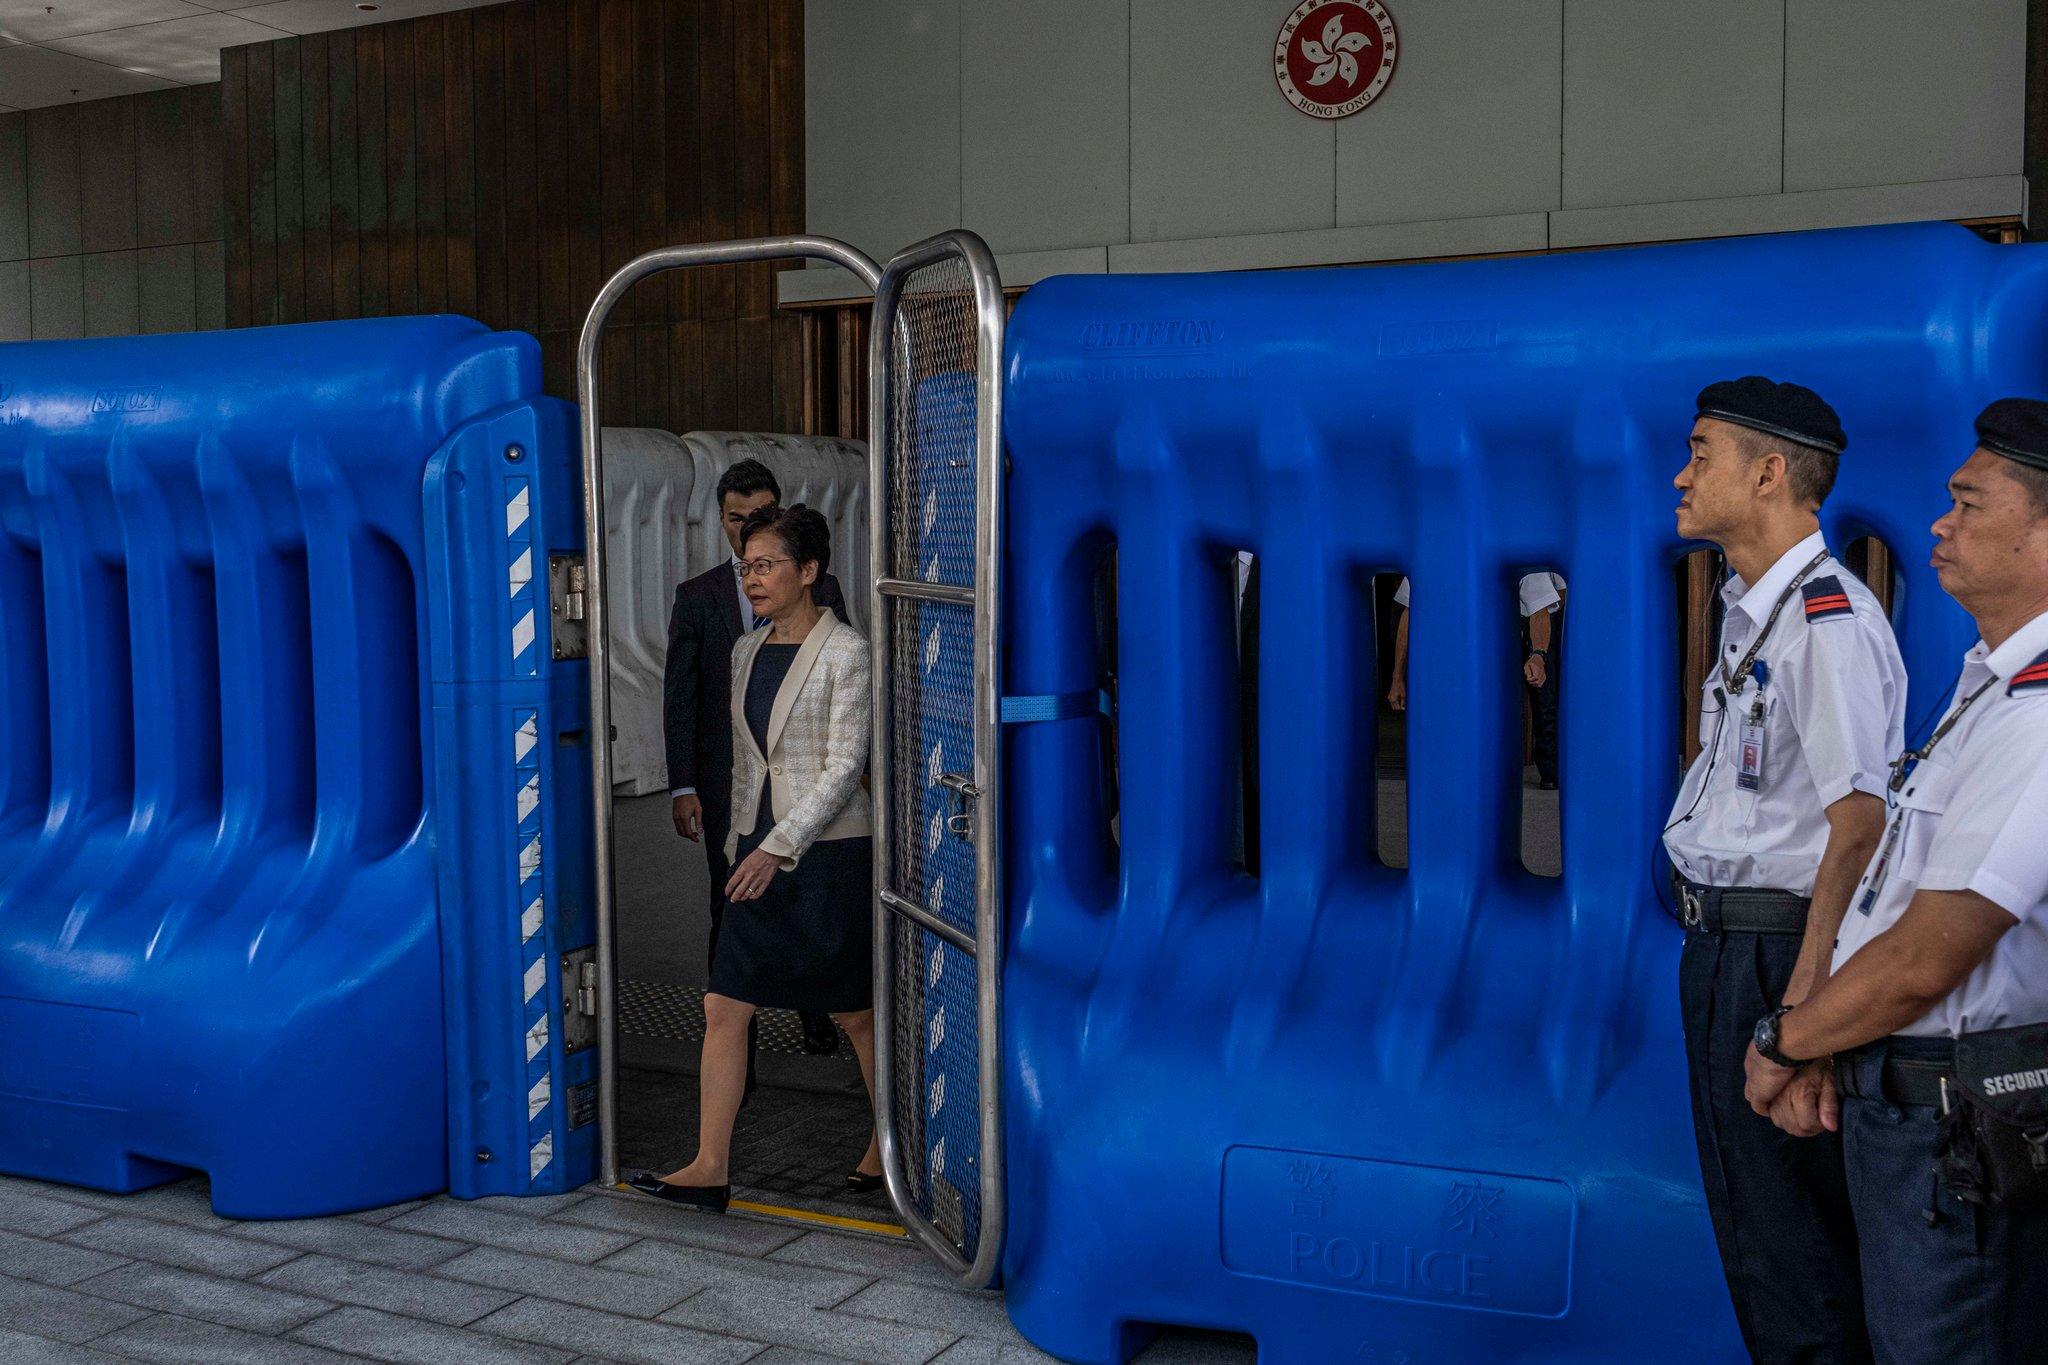 Leak Shows Beijing's Tight Rein on Hong Kong Crisis